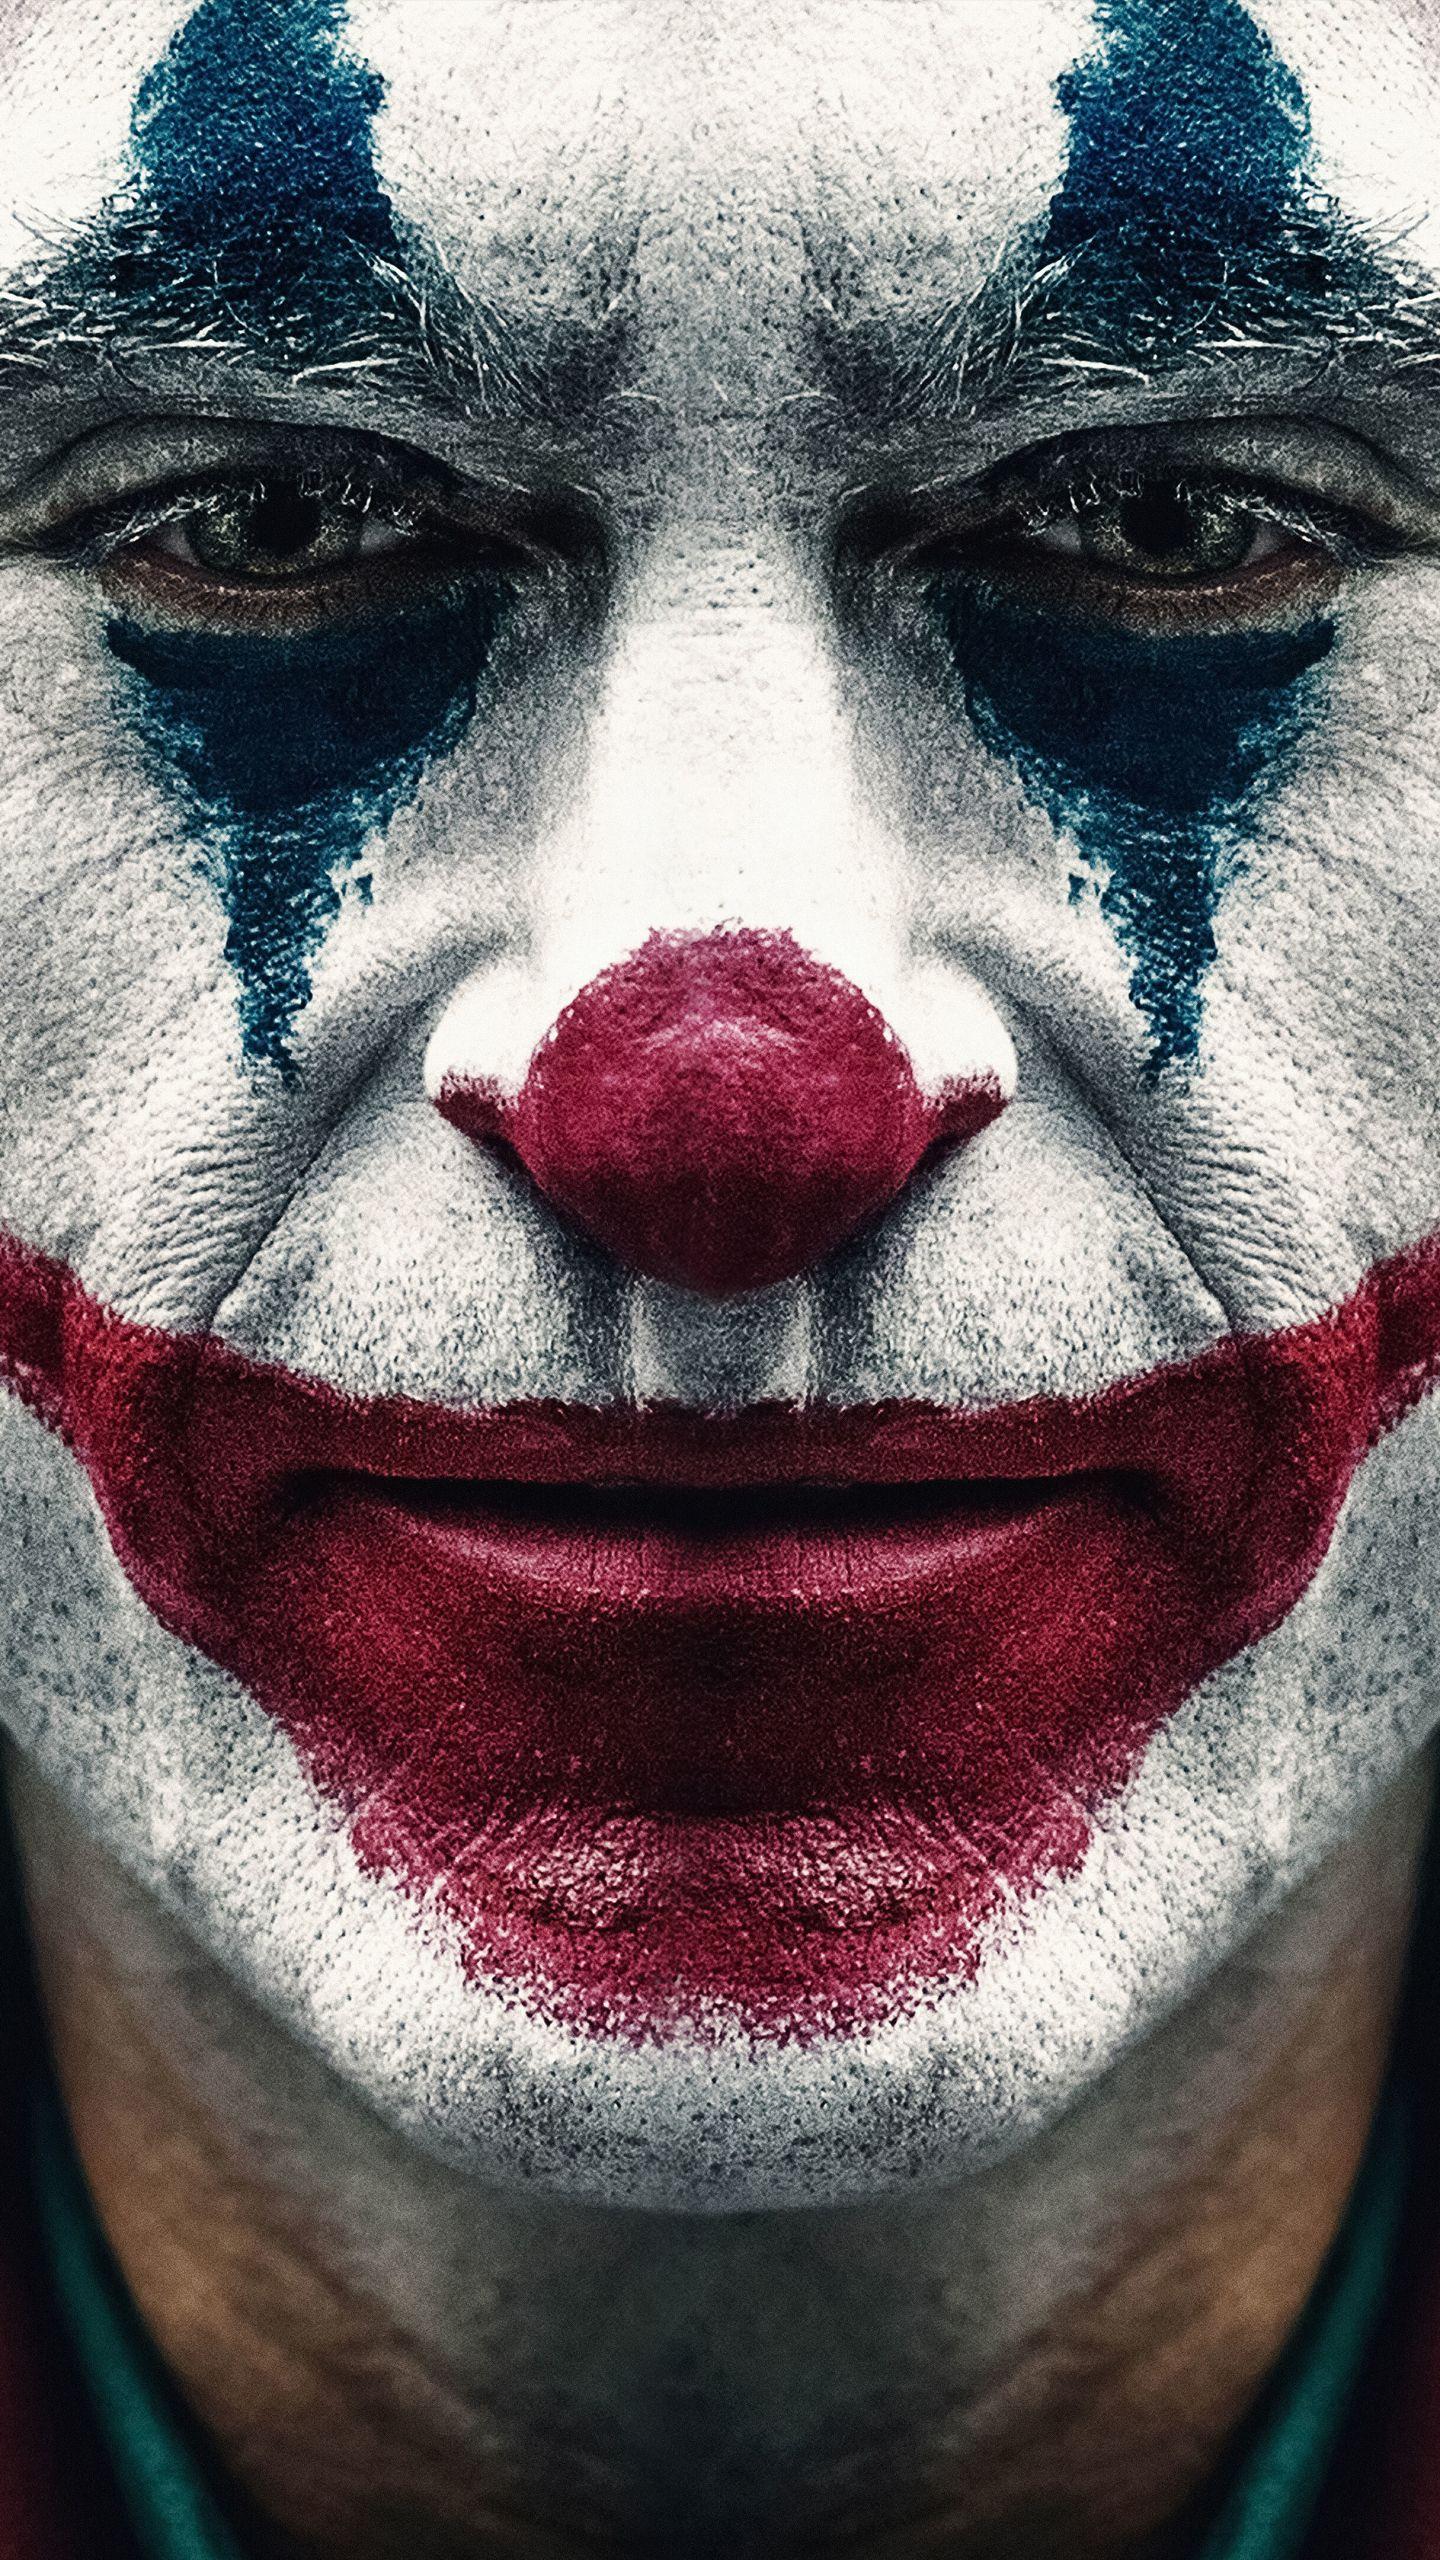 Joker Movie Wallpaper Mywallpapers Site Joker Images Joker Poster Joker Hd Wallpaper